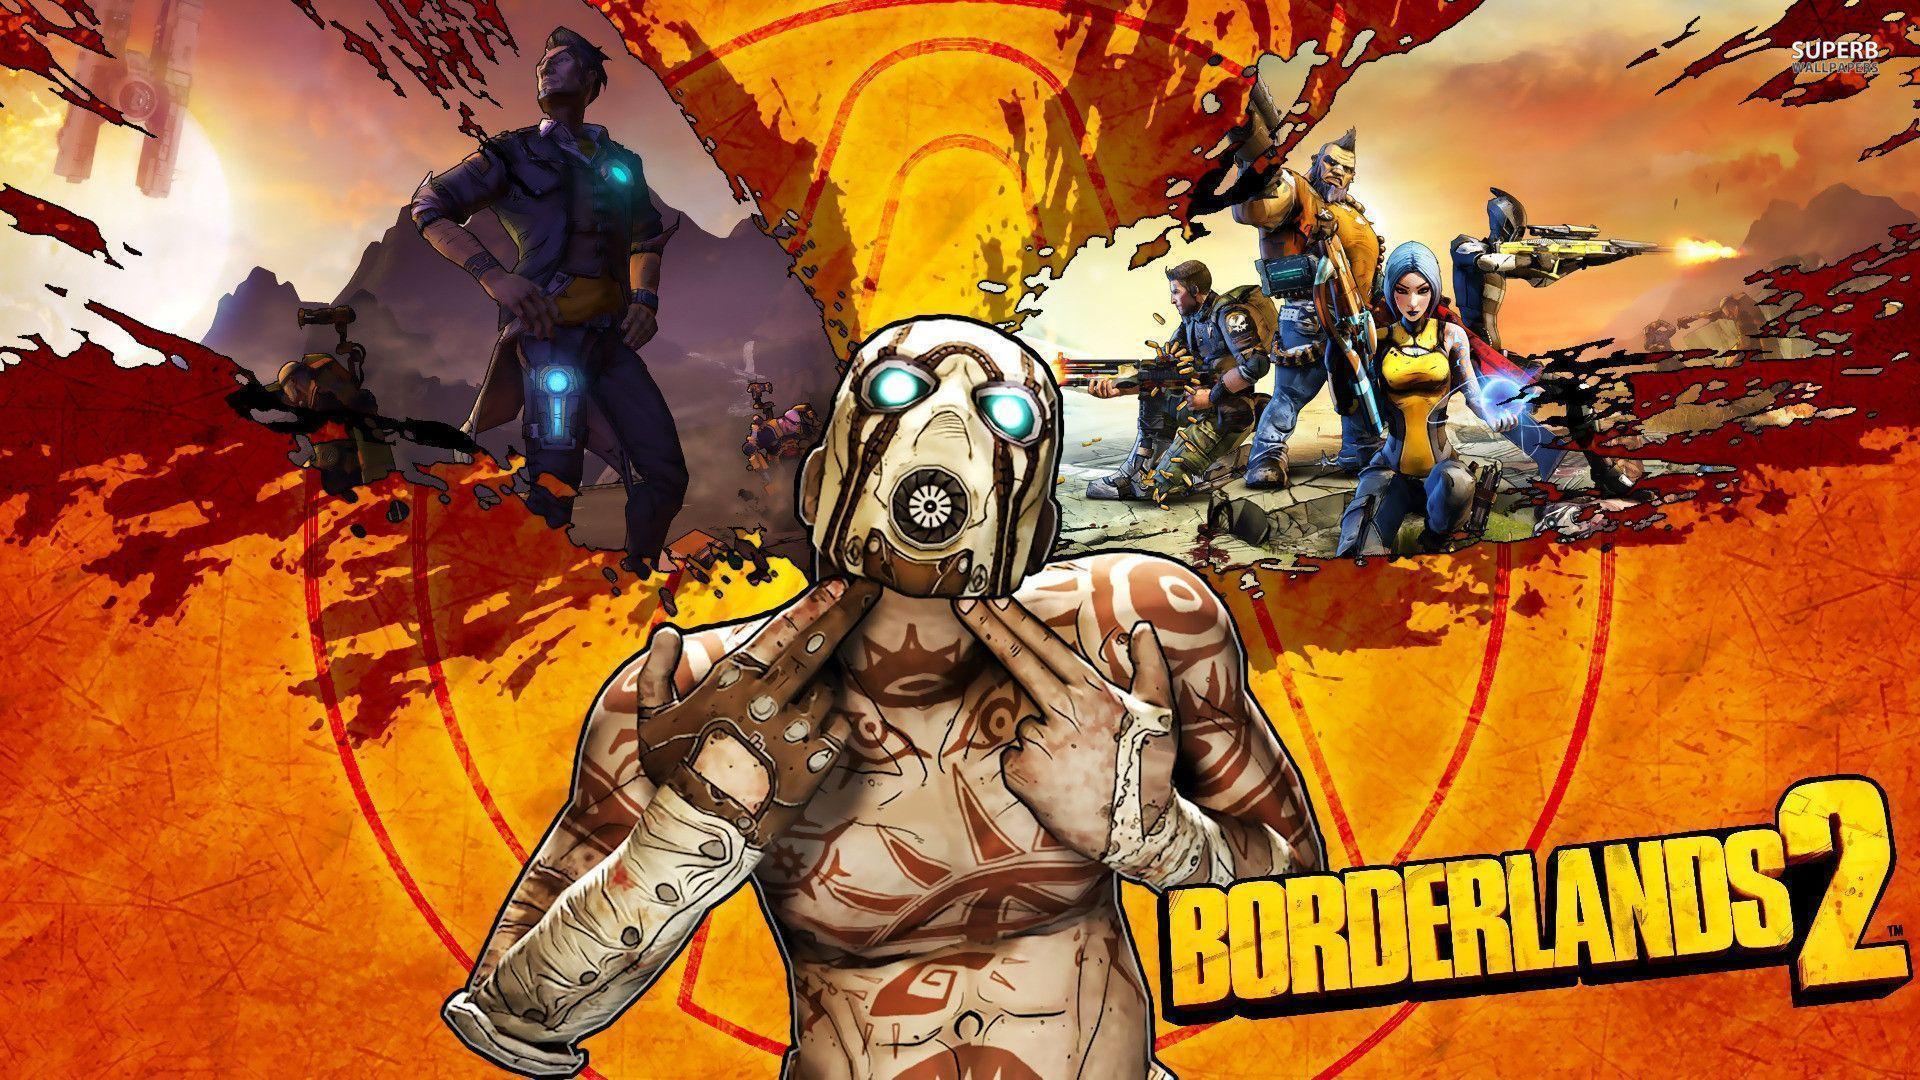 Borderlands 2 Wallpaper HD